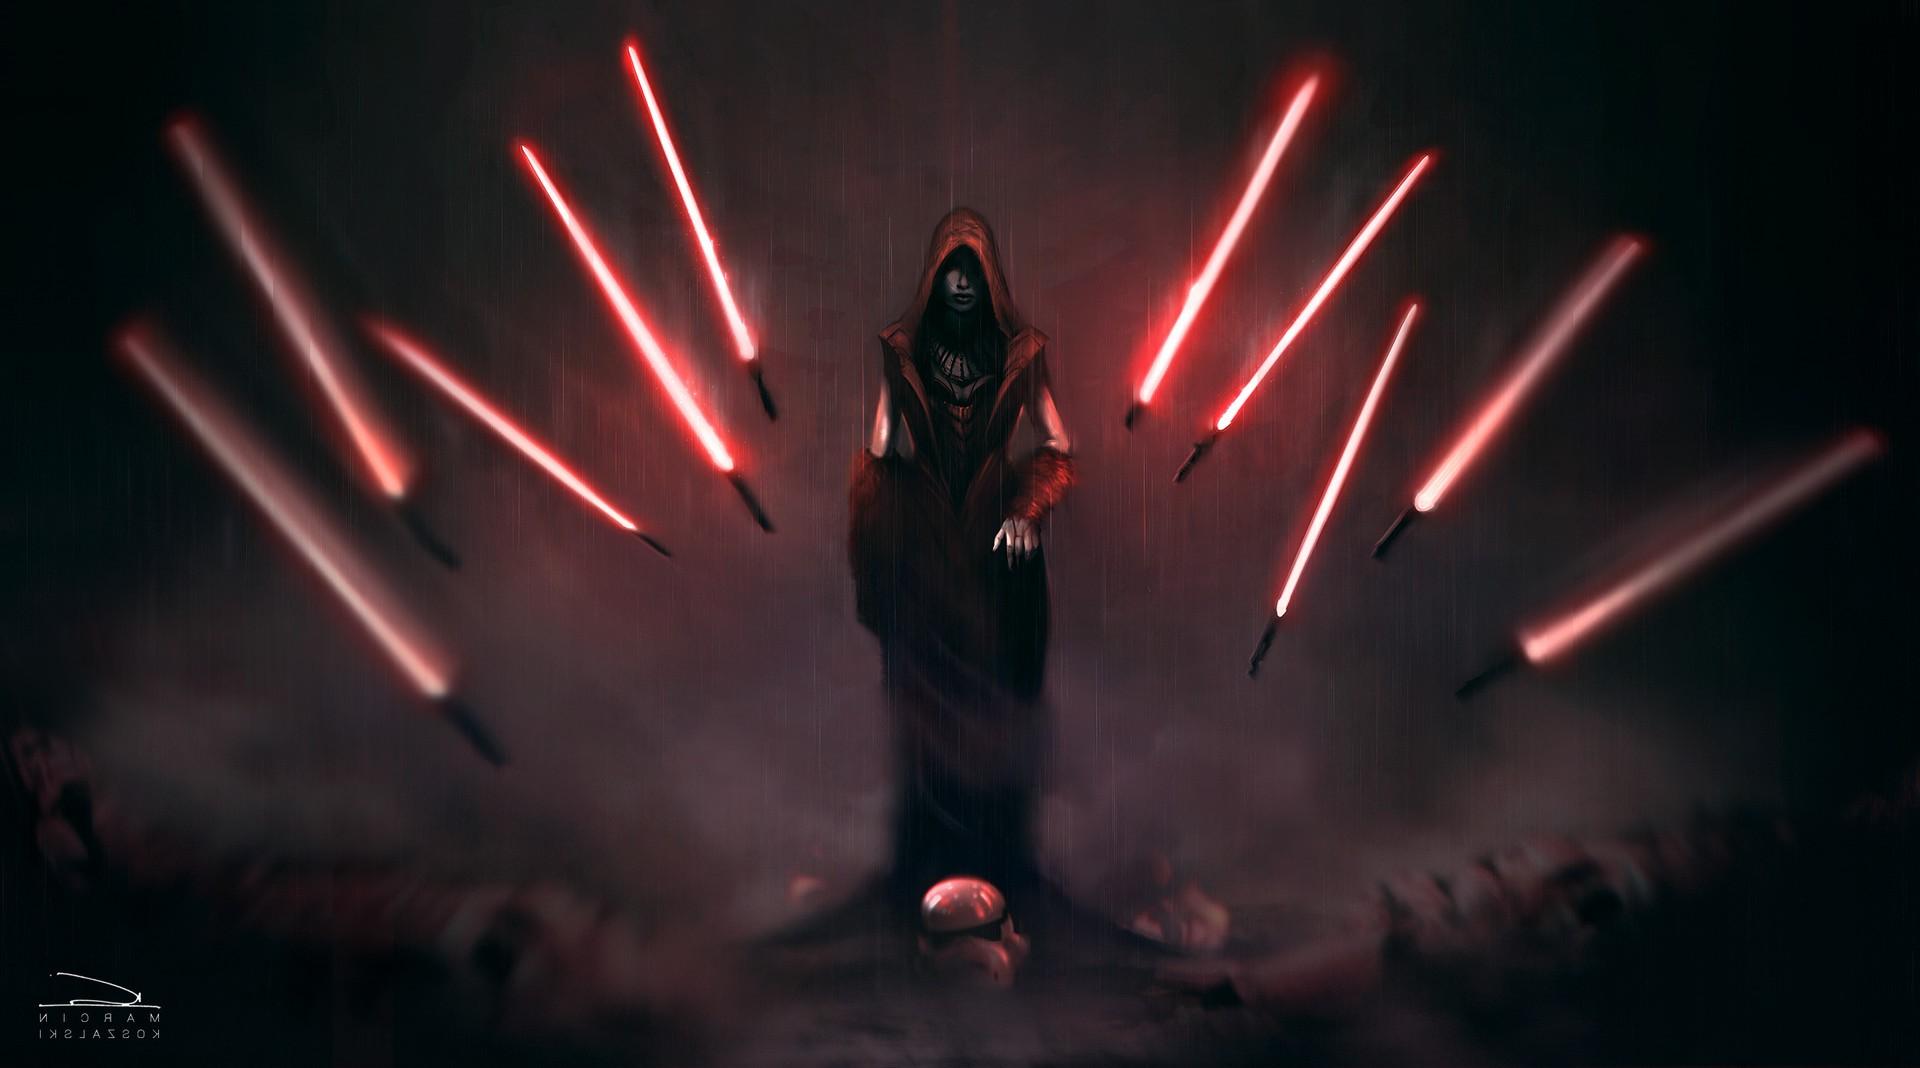 Fantasy Art Artwork Lightsaber Star Wars Sith 1920x1068